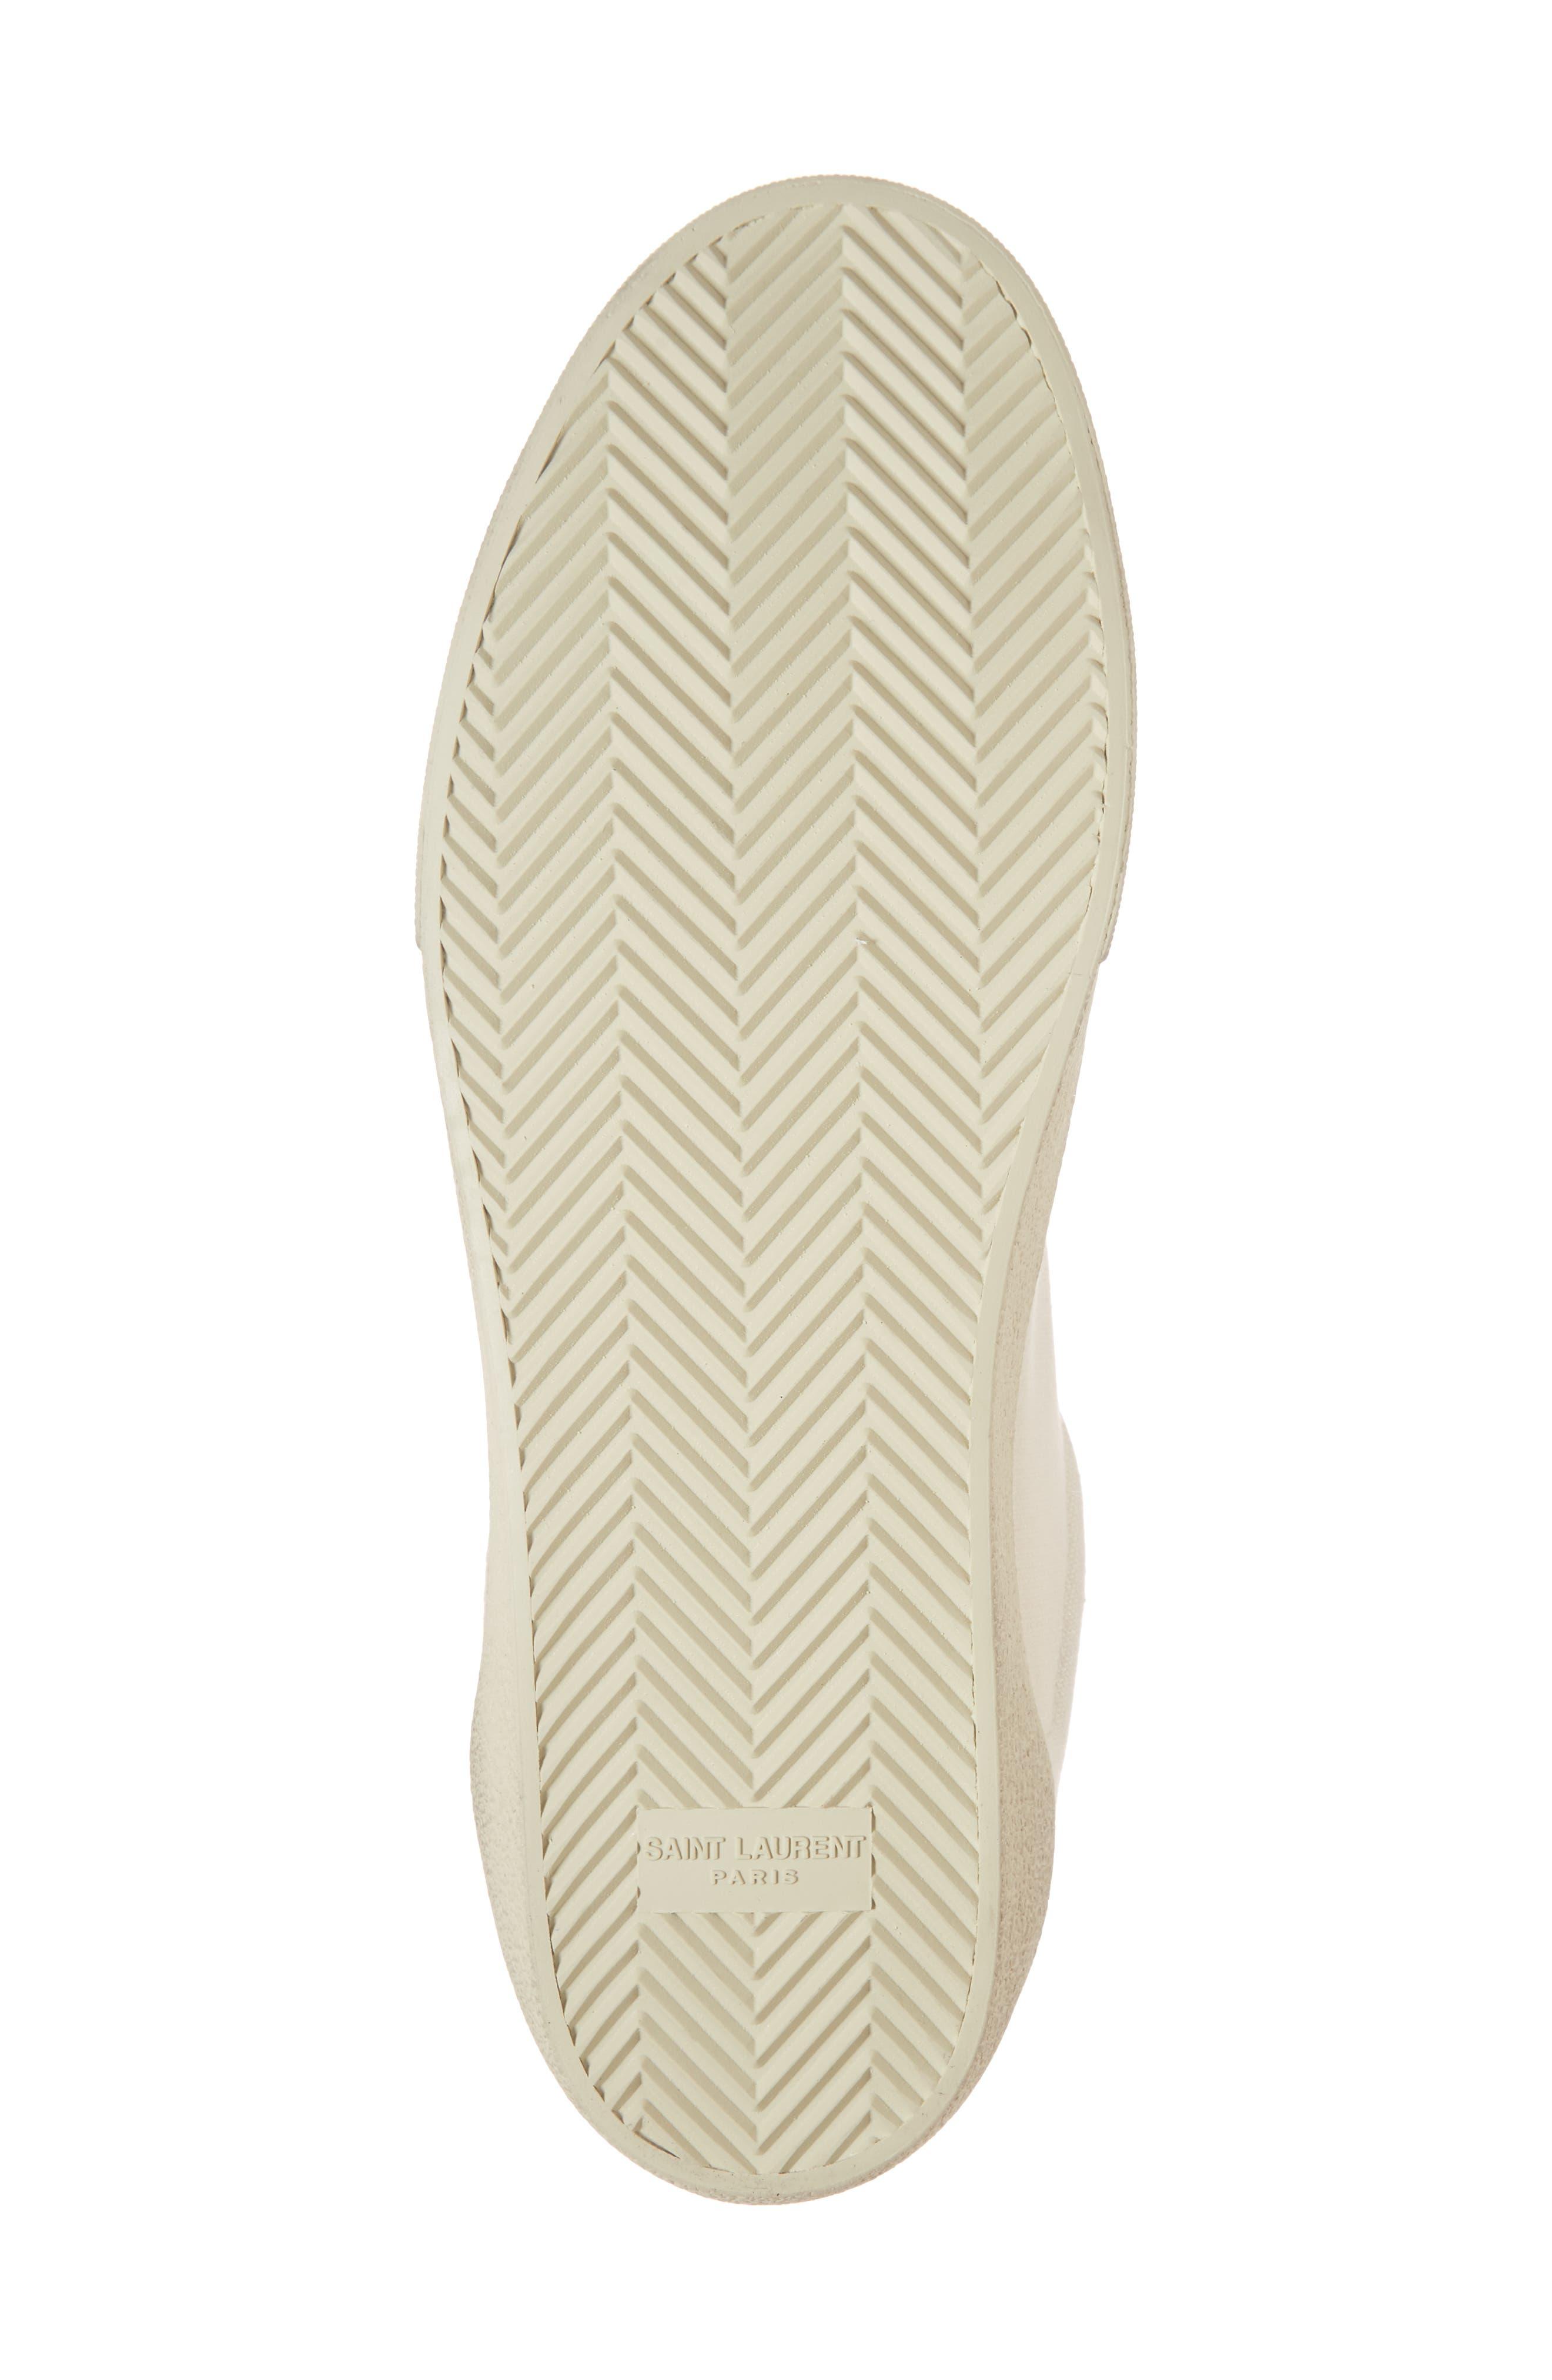 SAINT LAURENT,                             Logo Embroidered Sneaker,                             Alternate thumbnail 6, color,                             9113 PANNA/PANNA